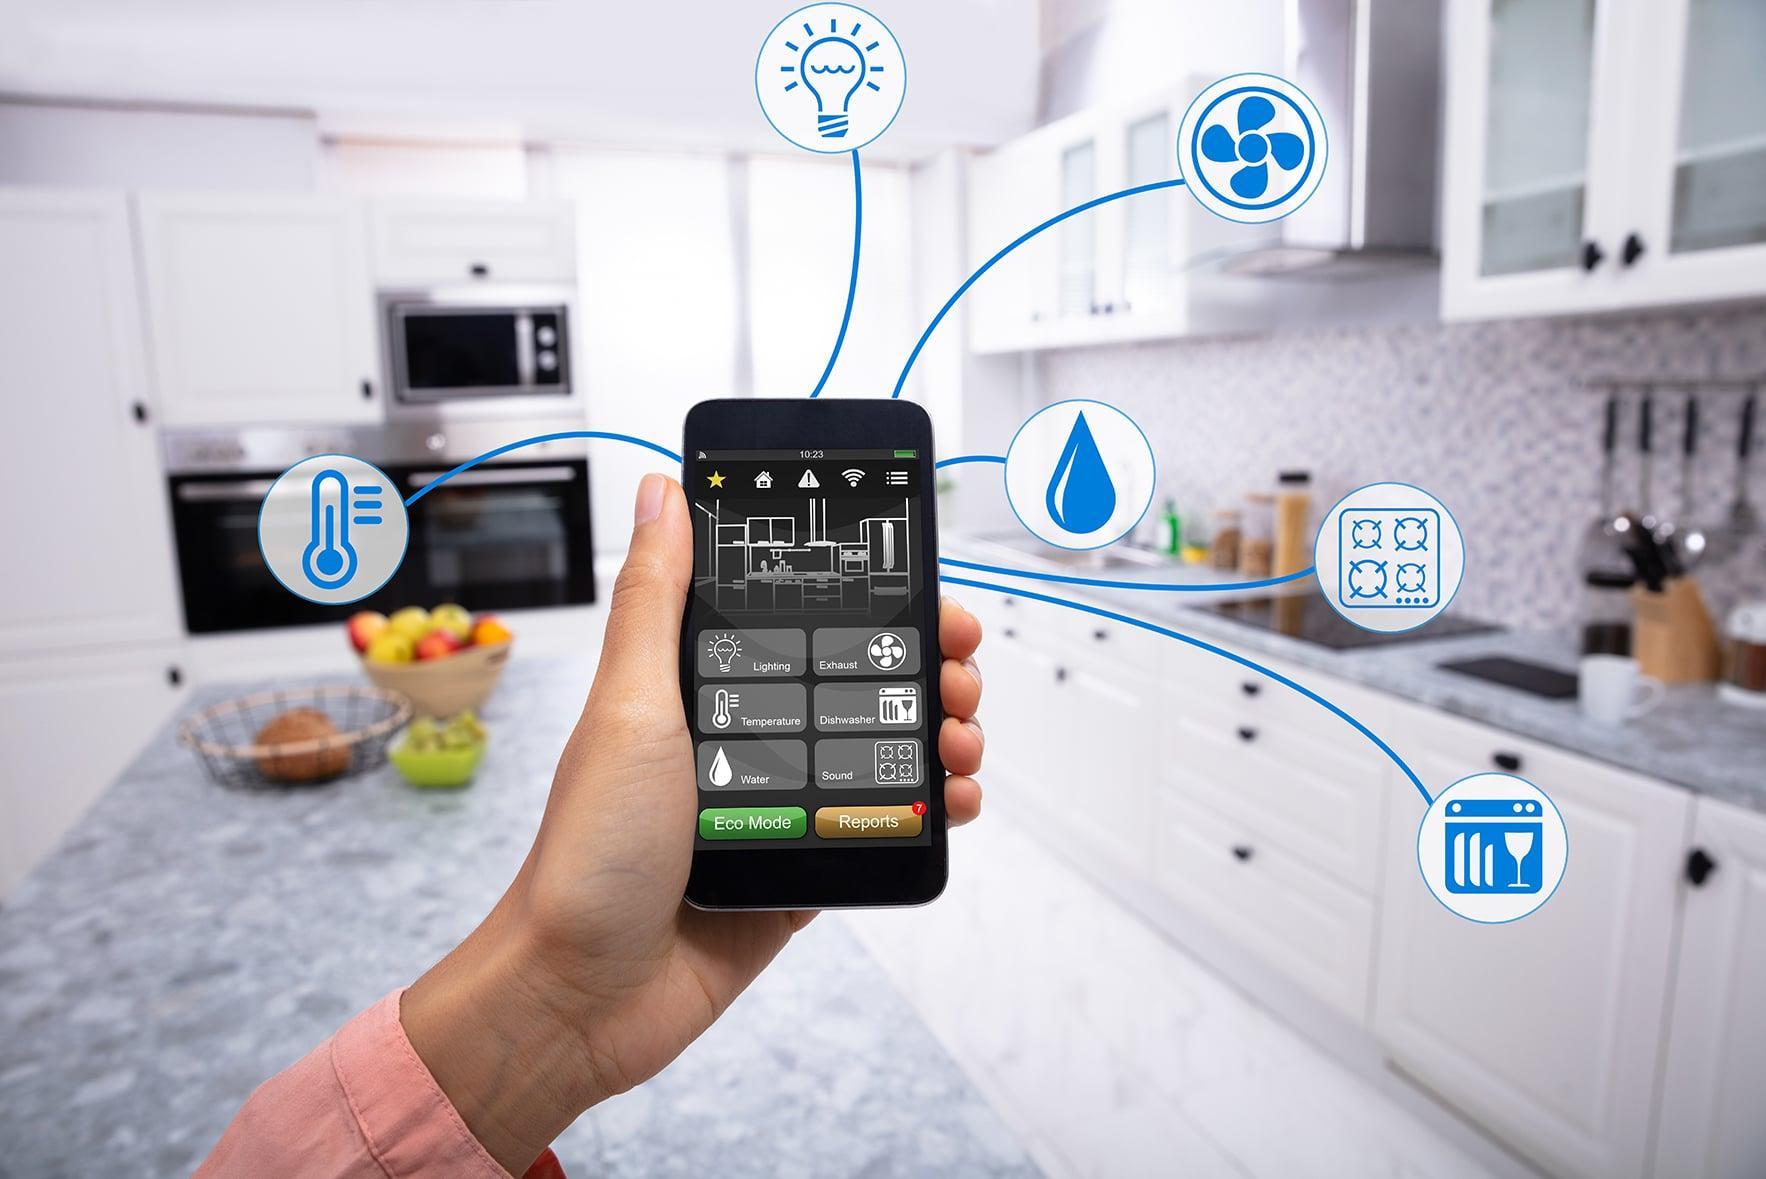 DIETEC Smartphone Home